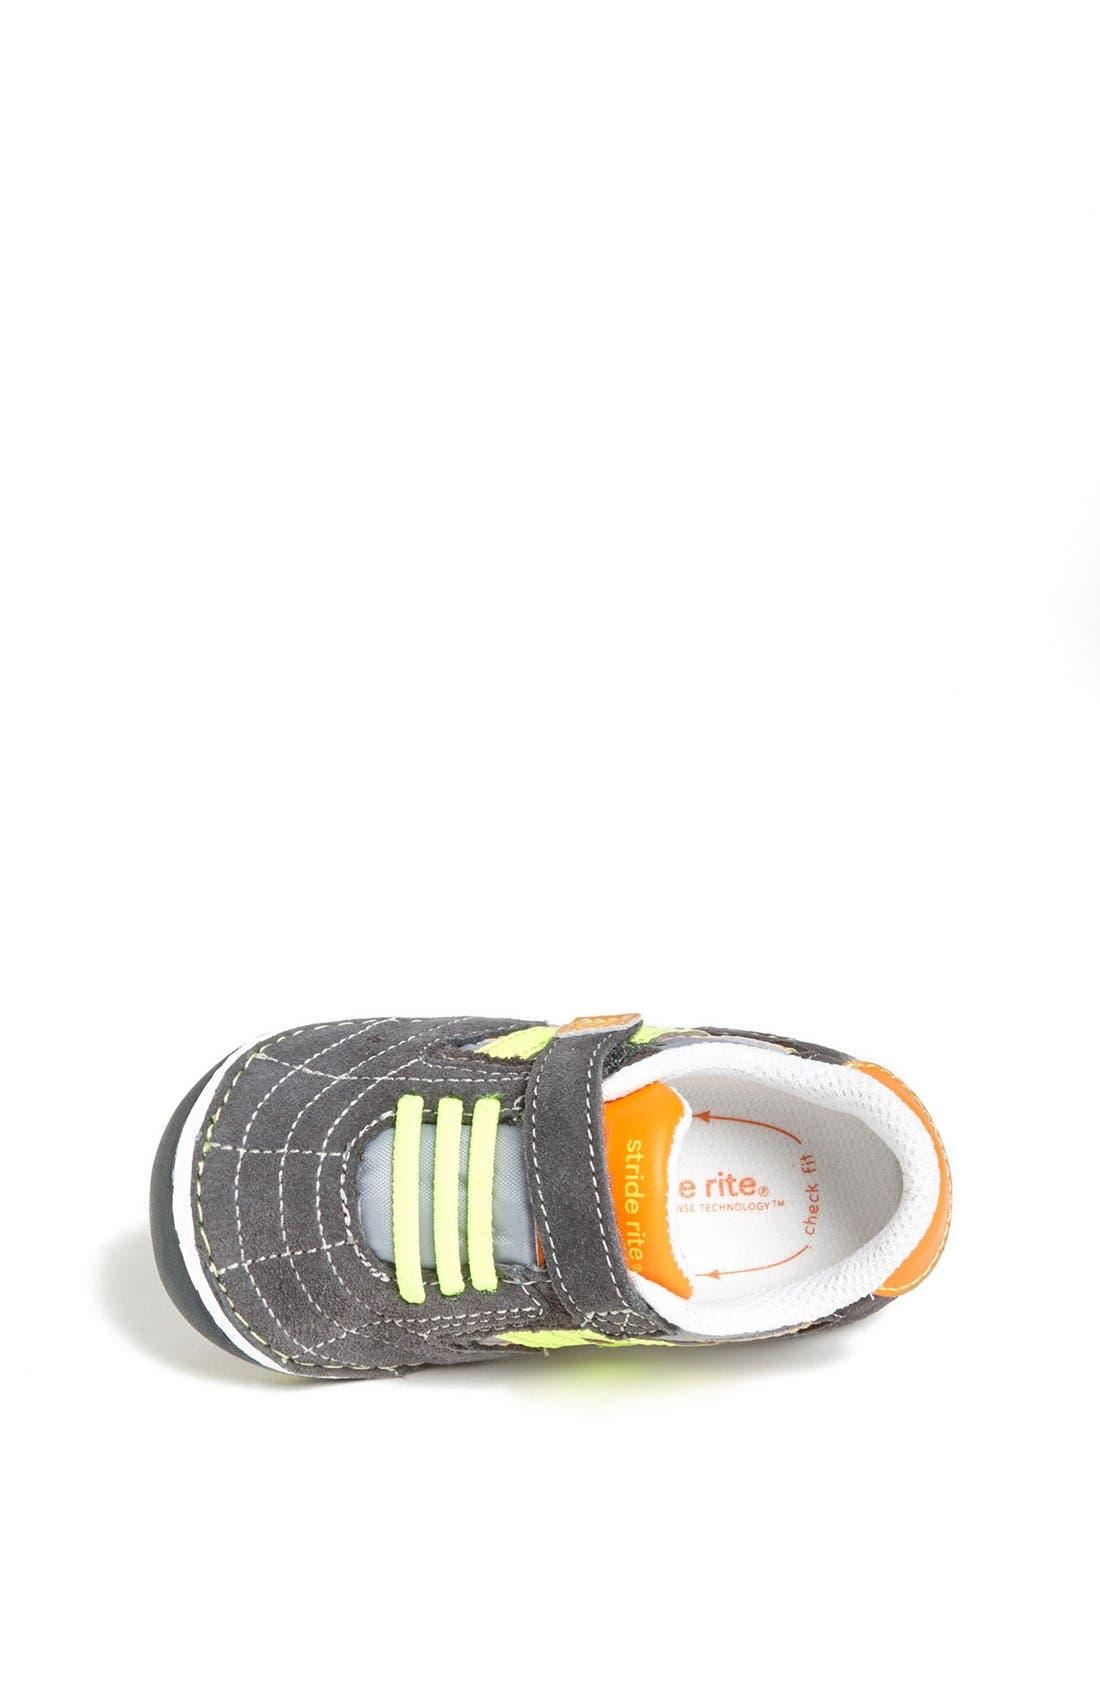 Alternate Image 3  - Stride Rite 'Jason' Sneaker (Baby & Walker)